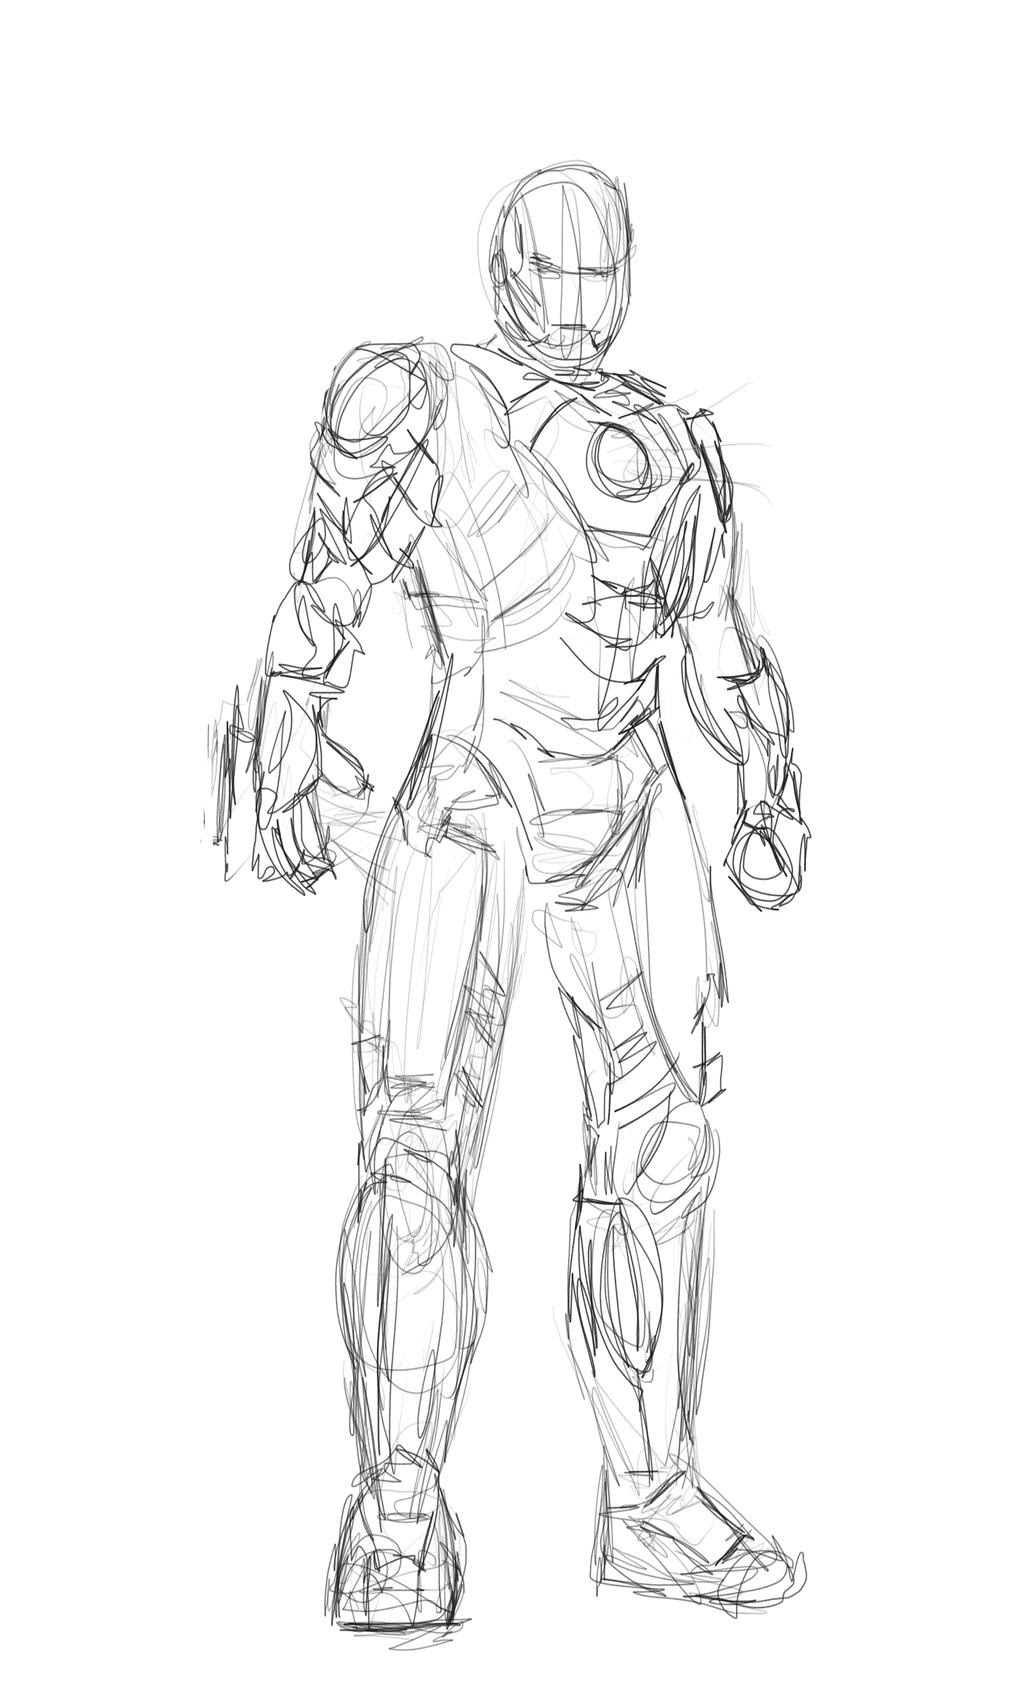 Iron Man Concept sketch by Pencilsketches on DeviantArt